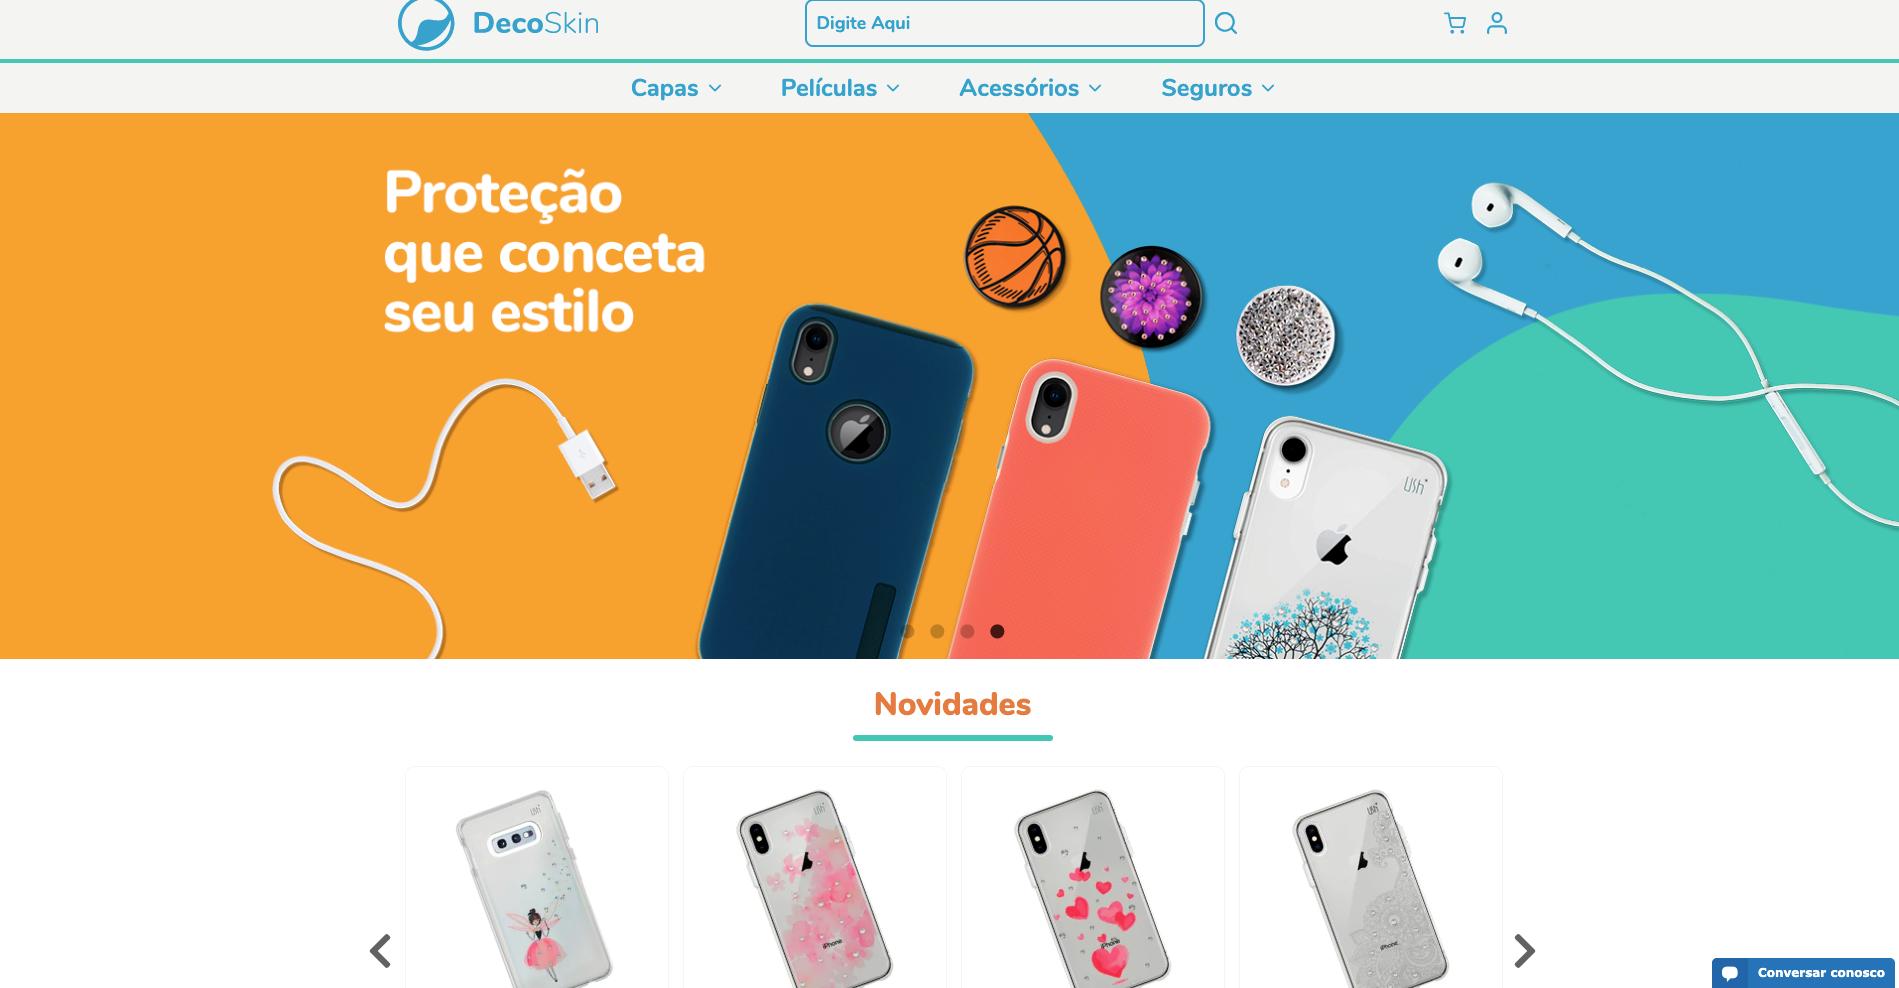 deco skin homepage